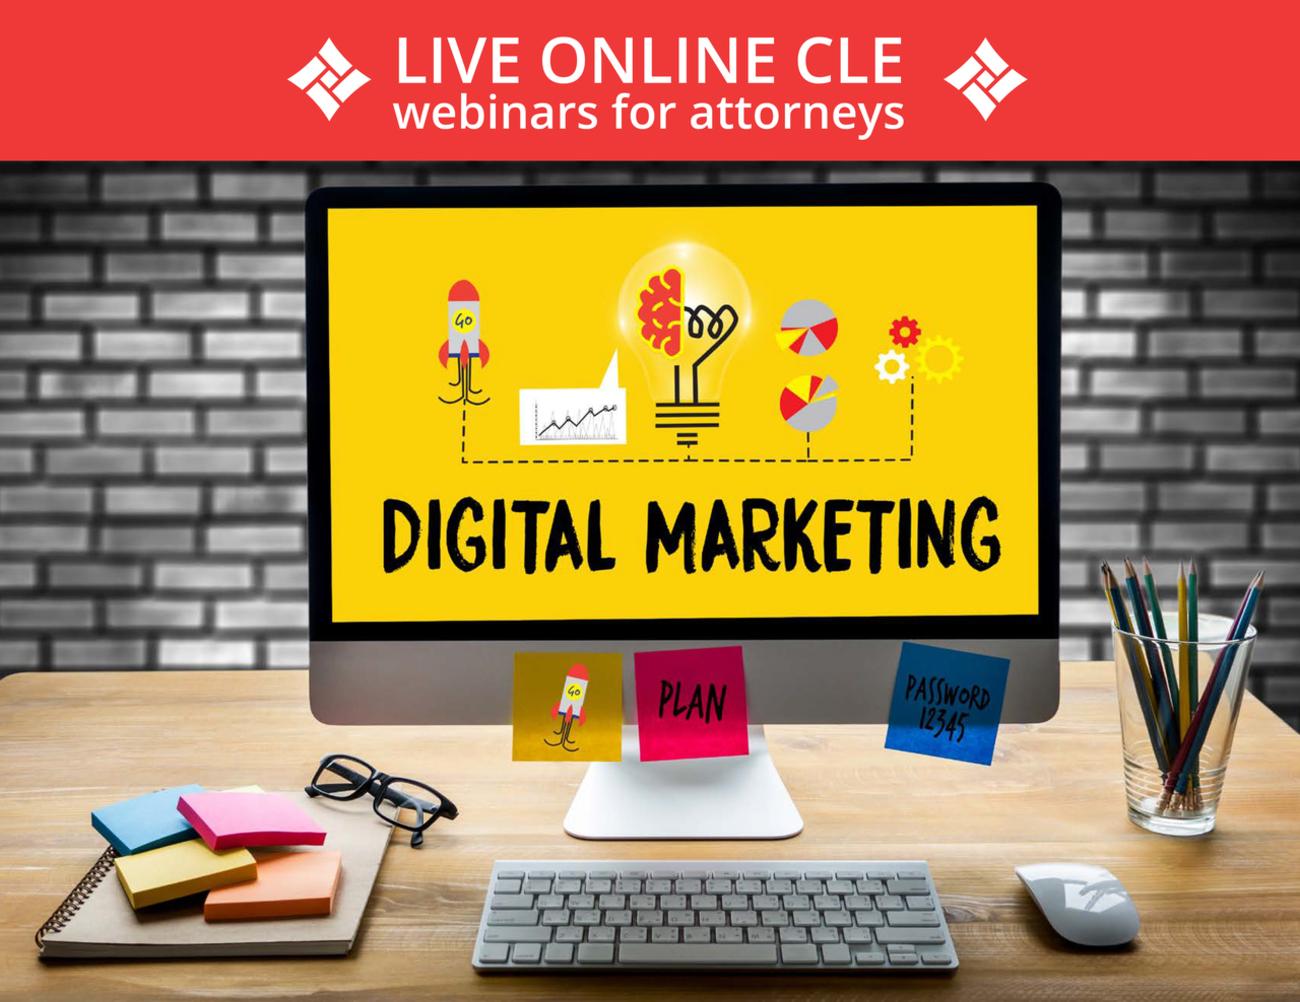 Live Online CLE Webinars for attorneys Digital Marketing